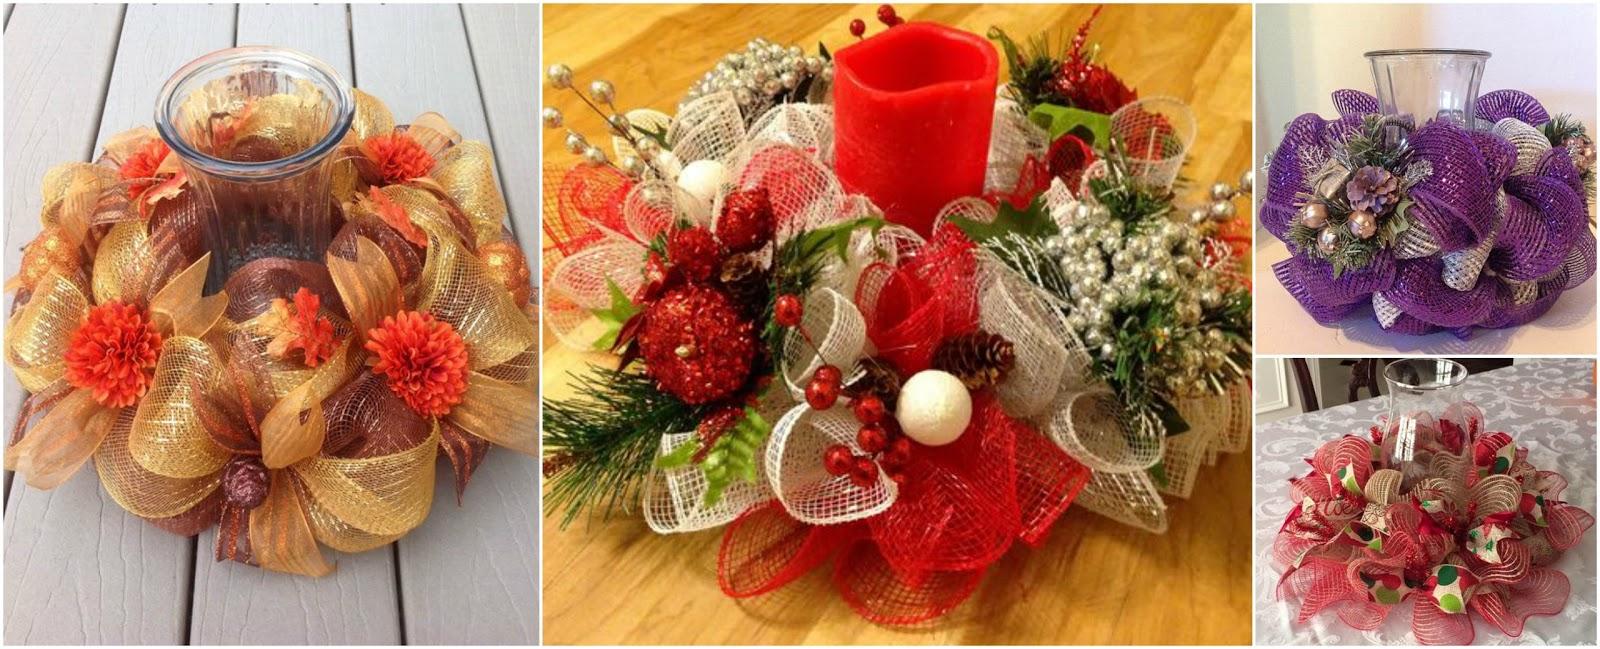 Aprende c mo hacer centros de mesa navide os con mallas - Hacer centros de navidad ...